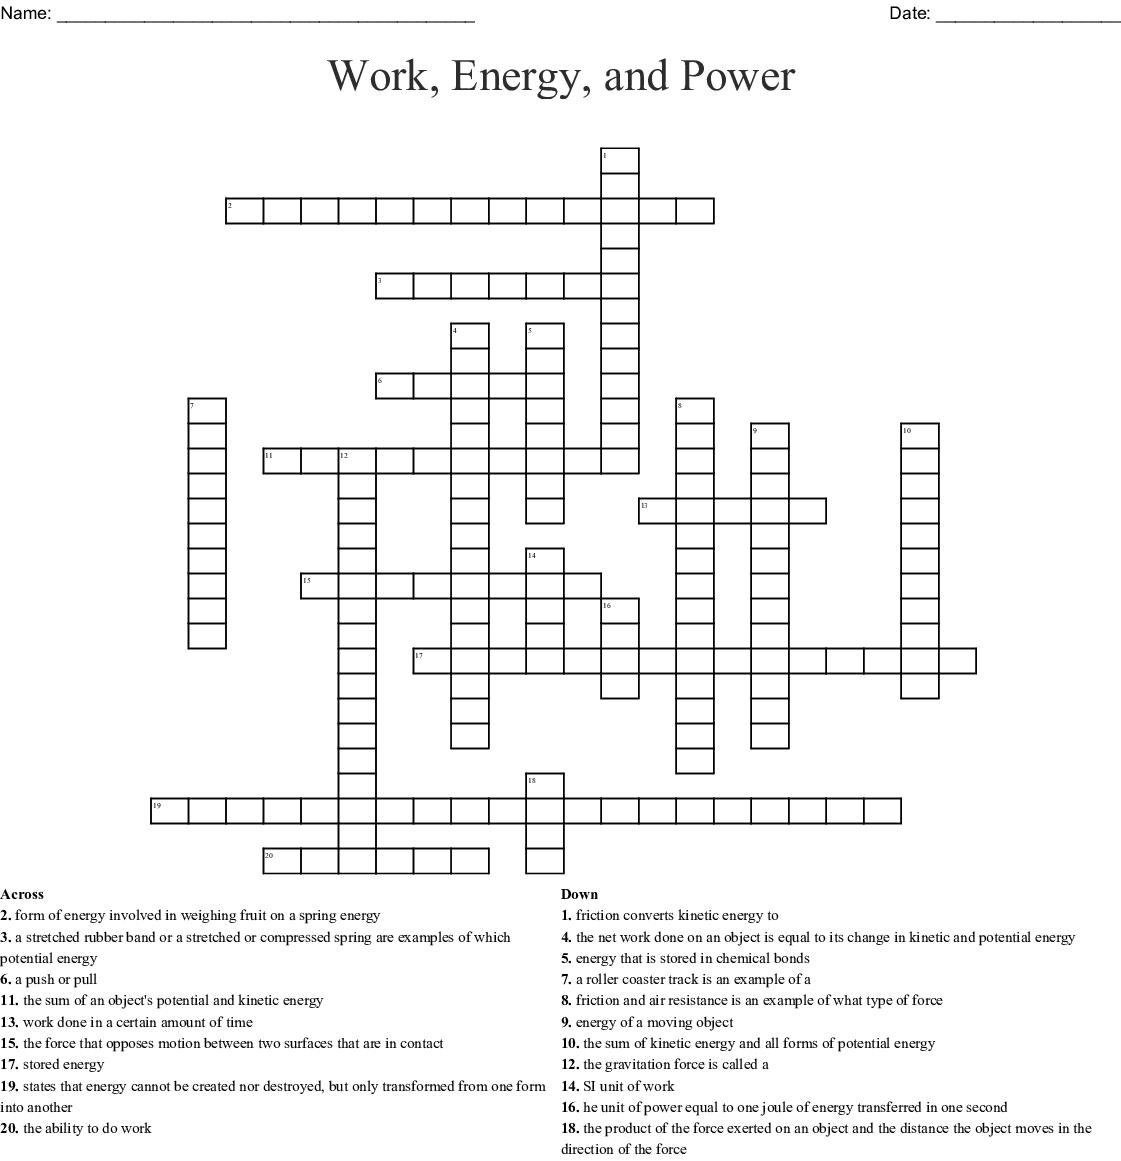 Work Energy And Power Crossword Word